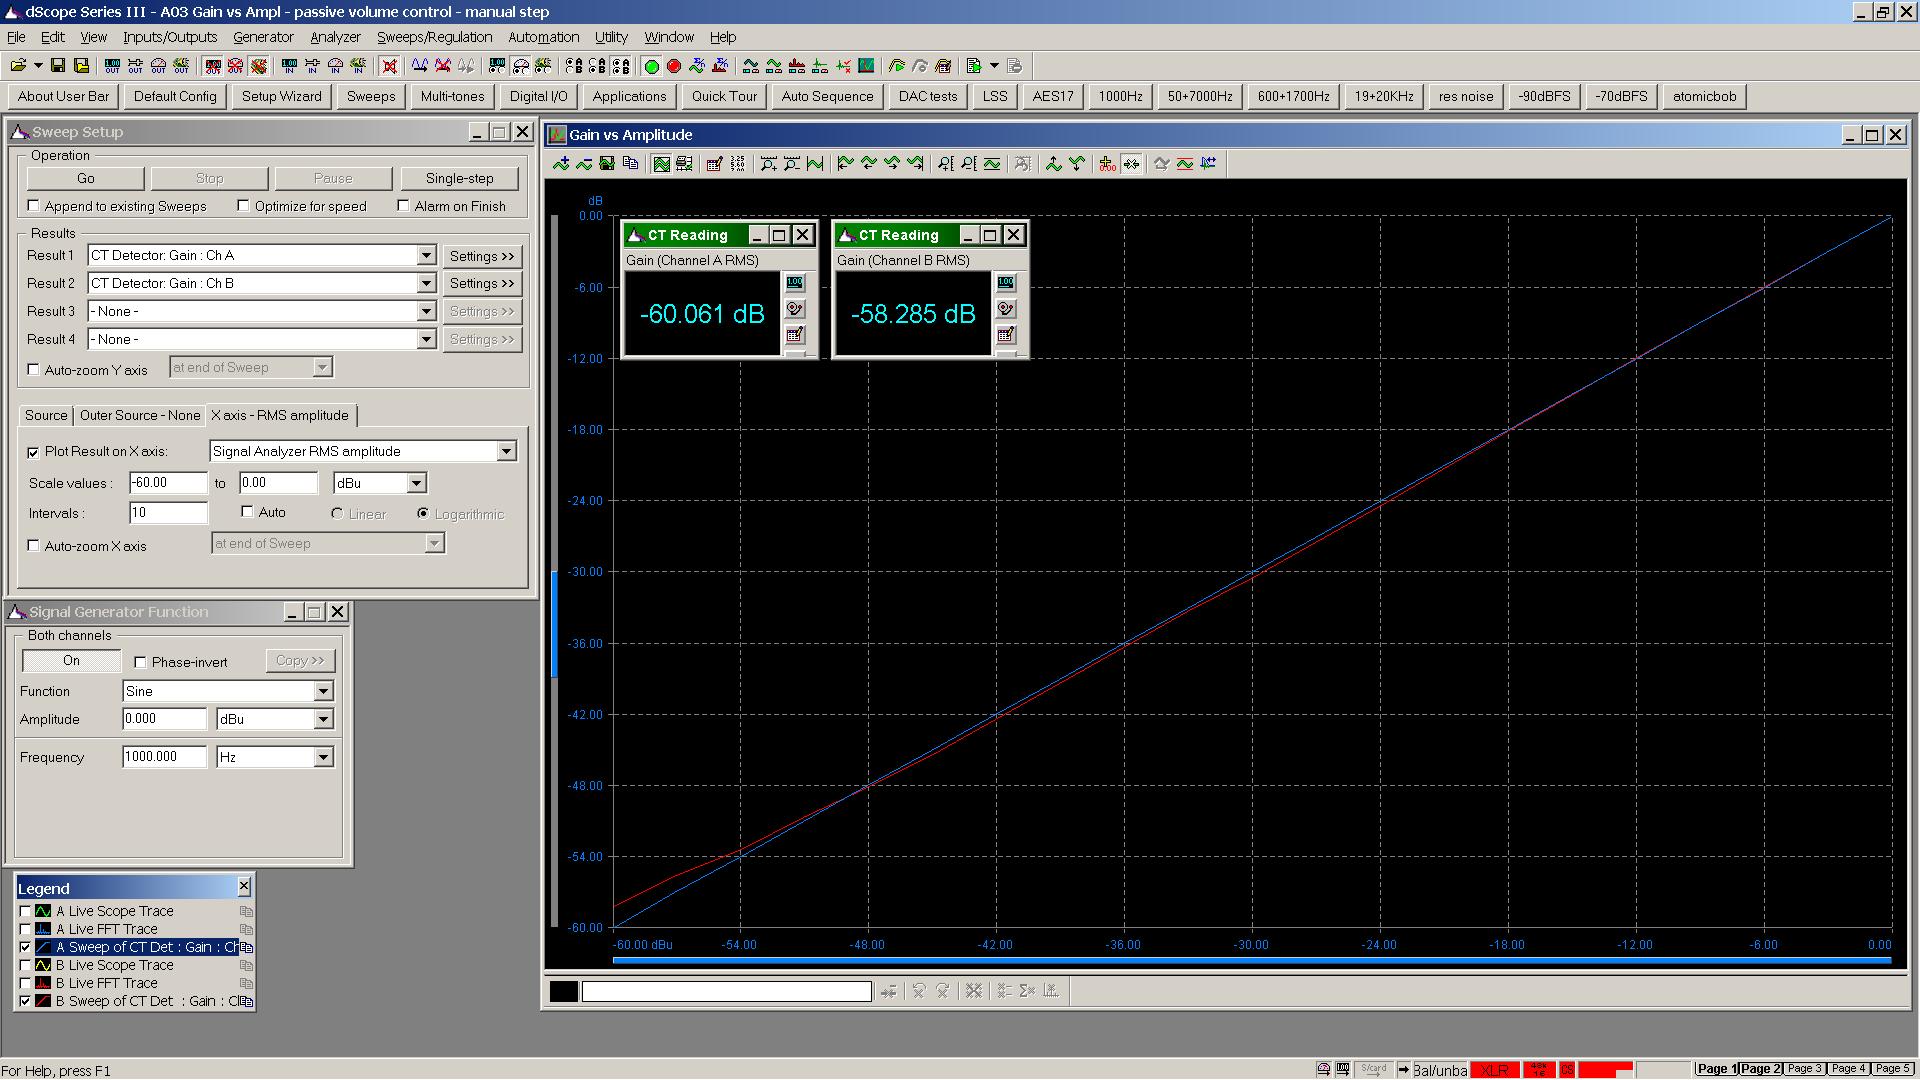 24 20190109 NS-05P A03 Gain vs Volume Control Setting.png